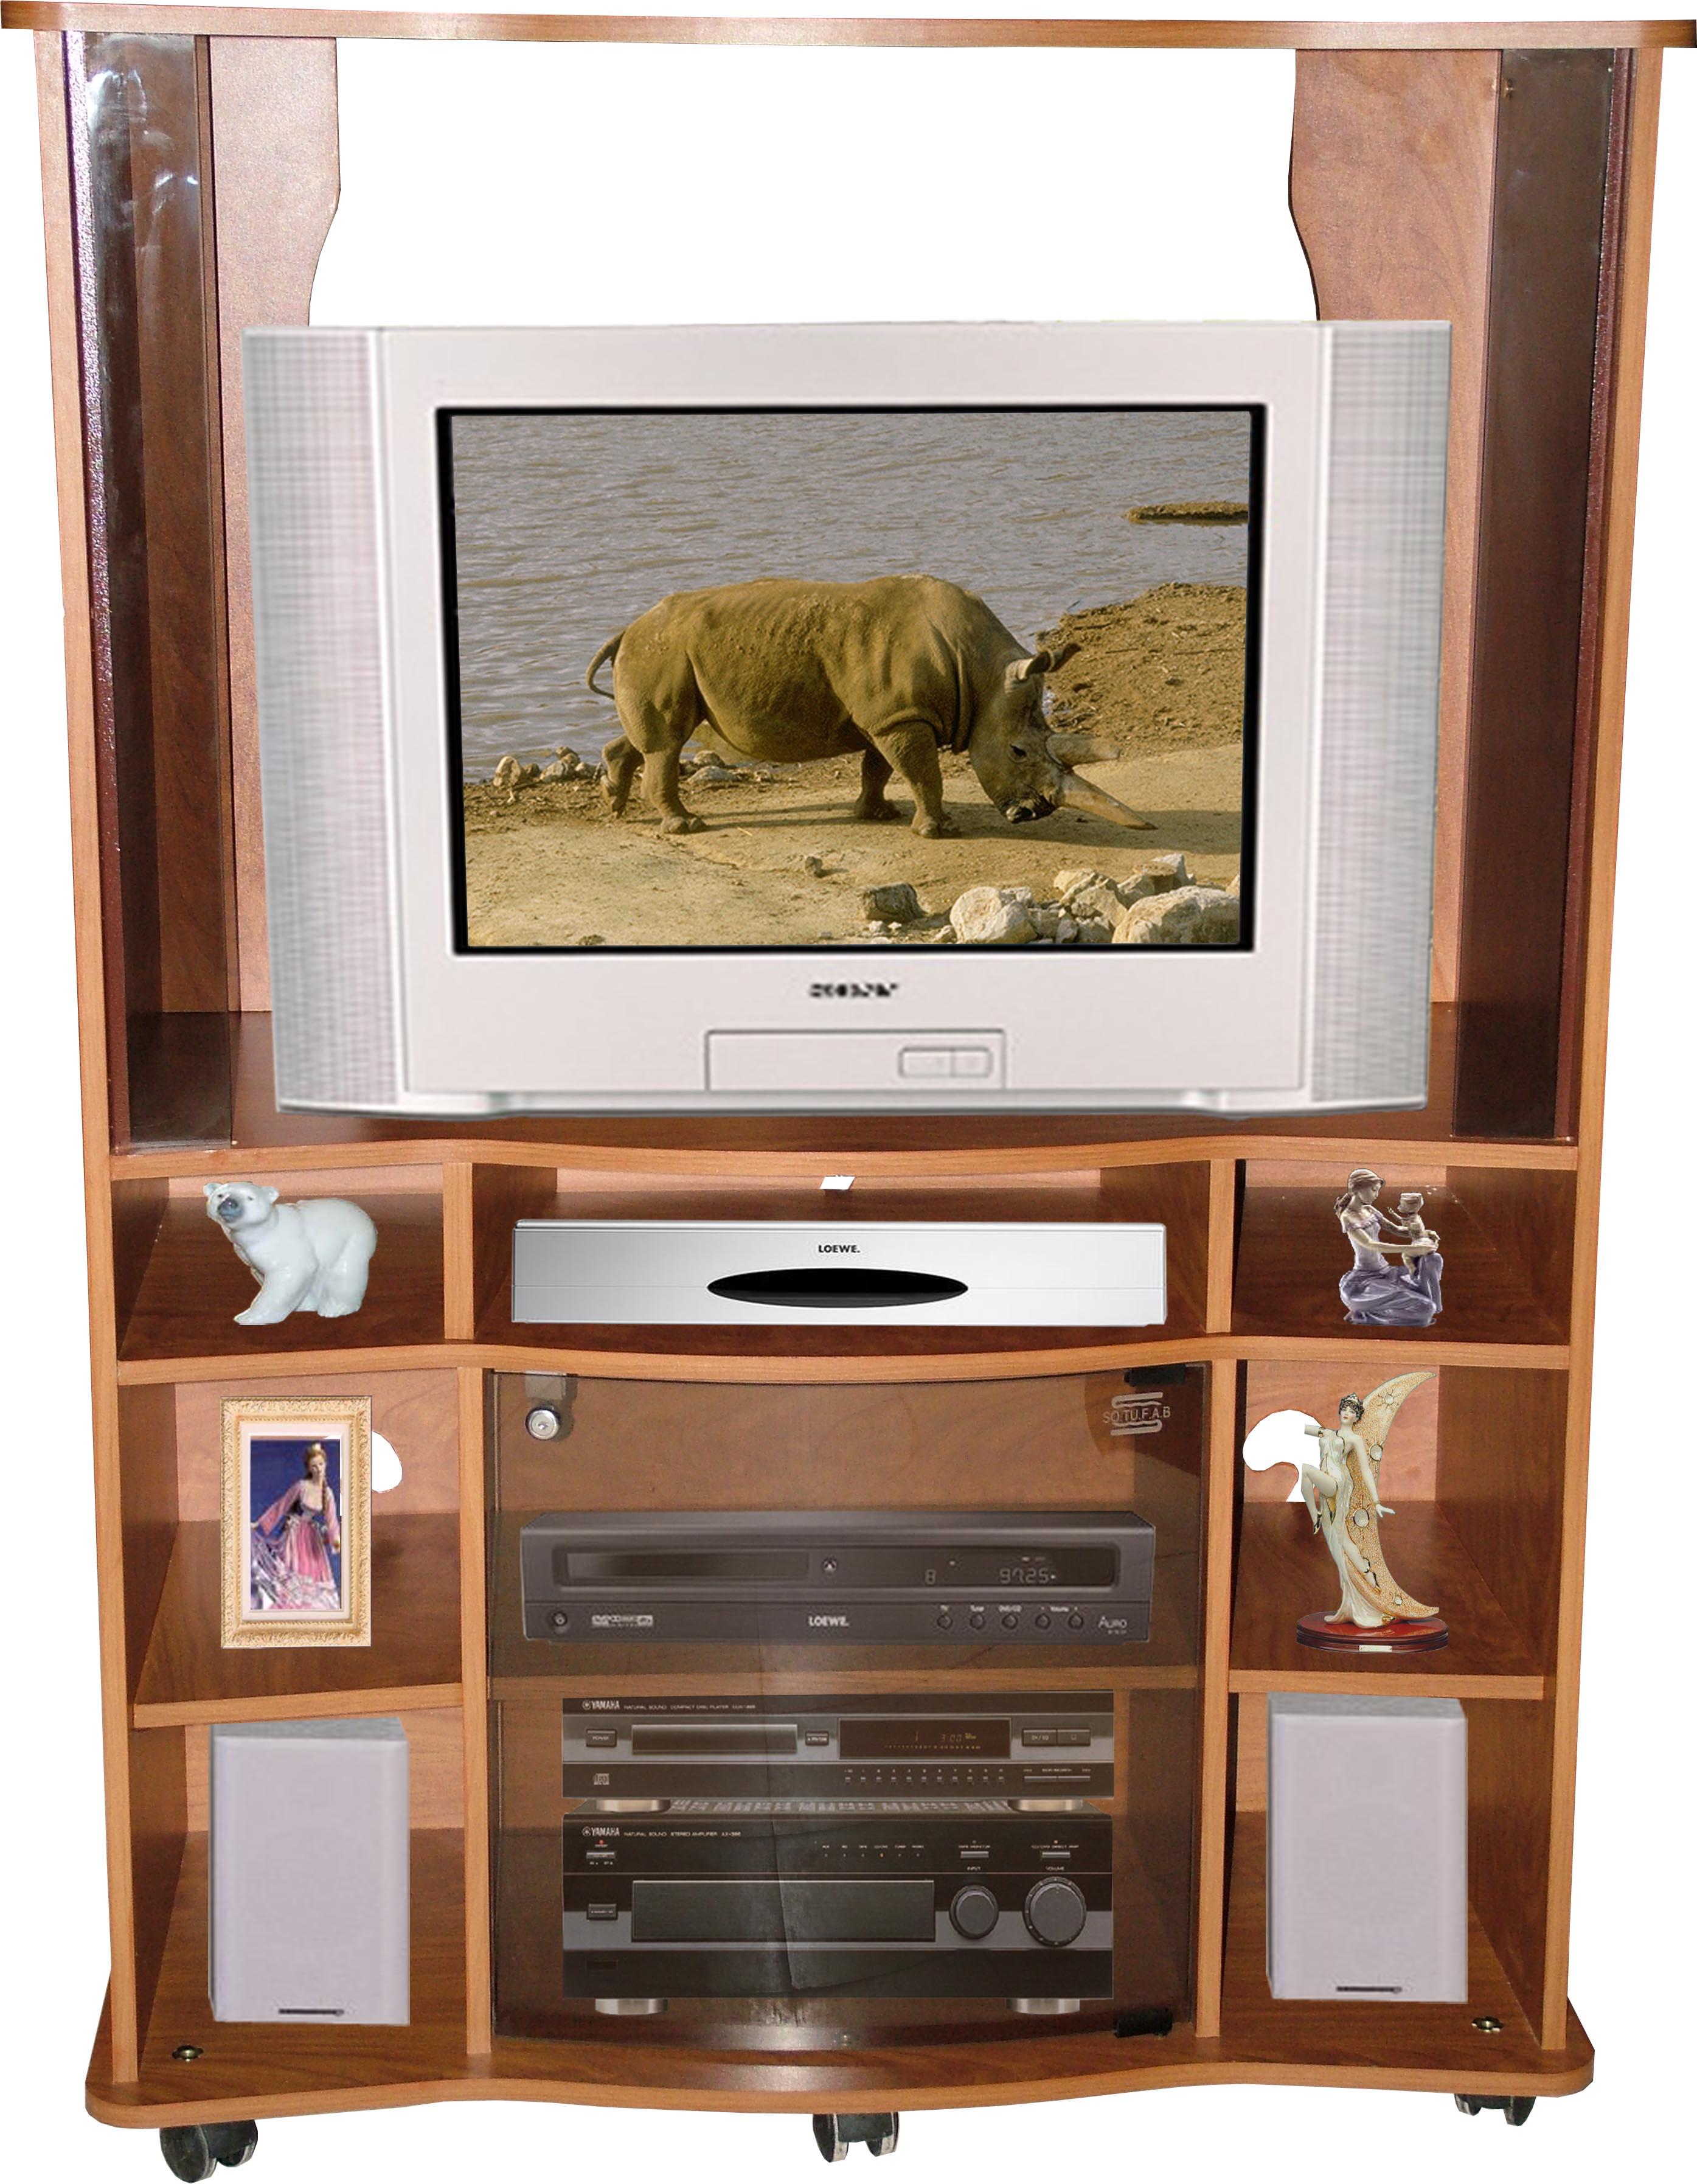 Meubles tv ecran plat atlas - Meuble tele ecran plat ...